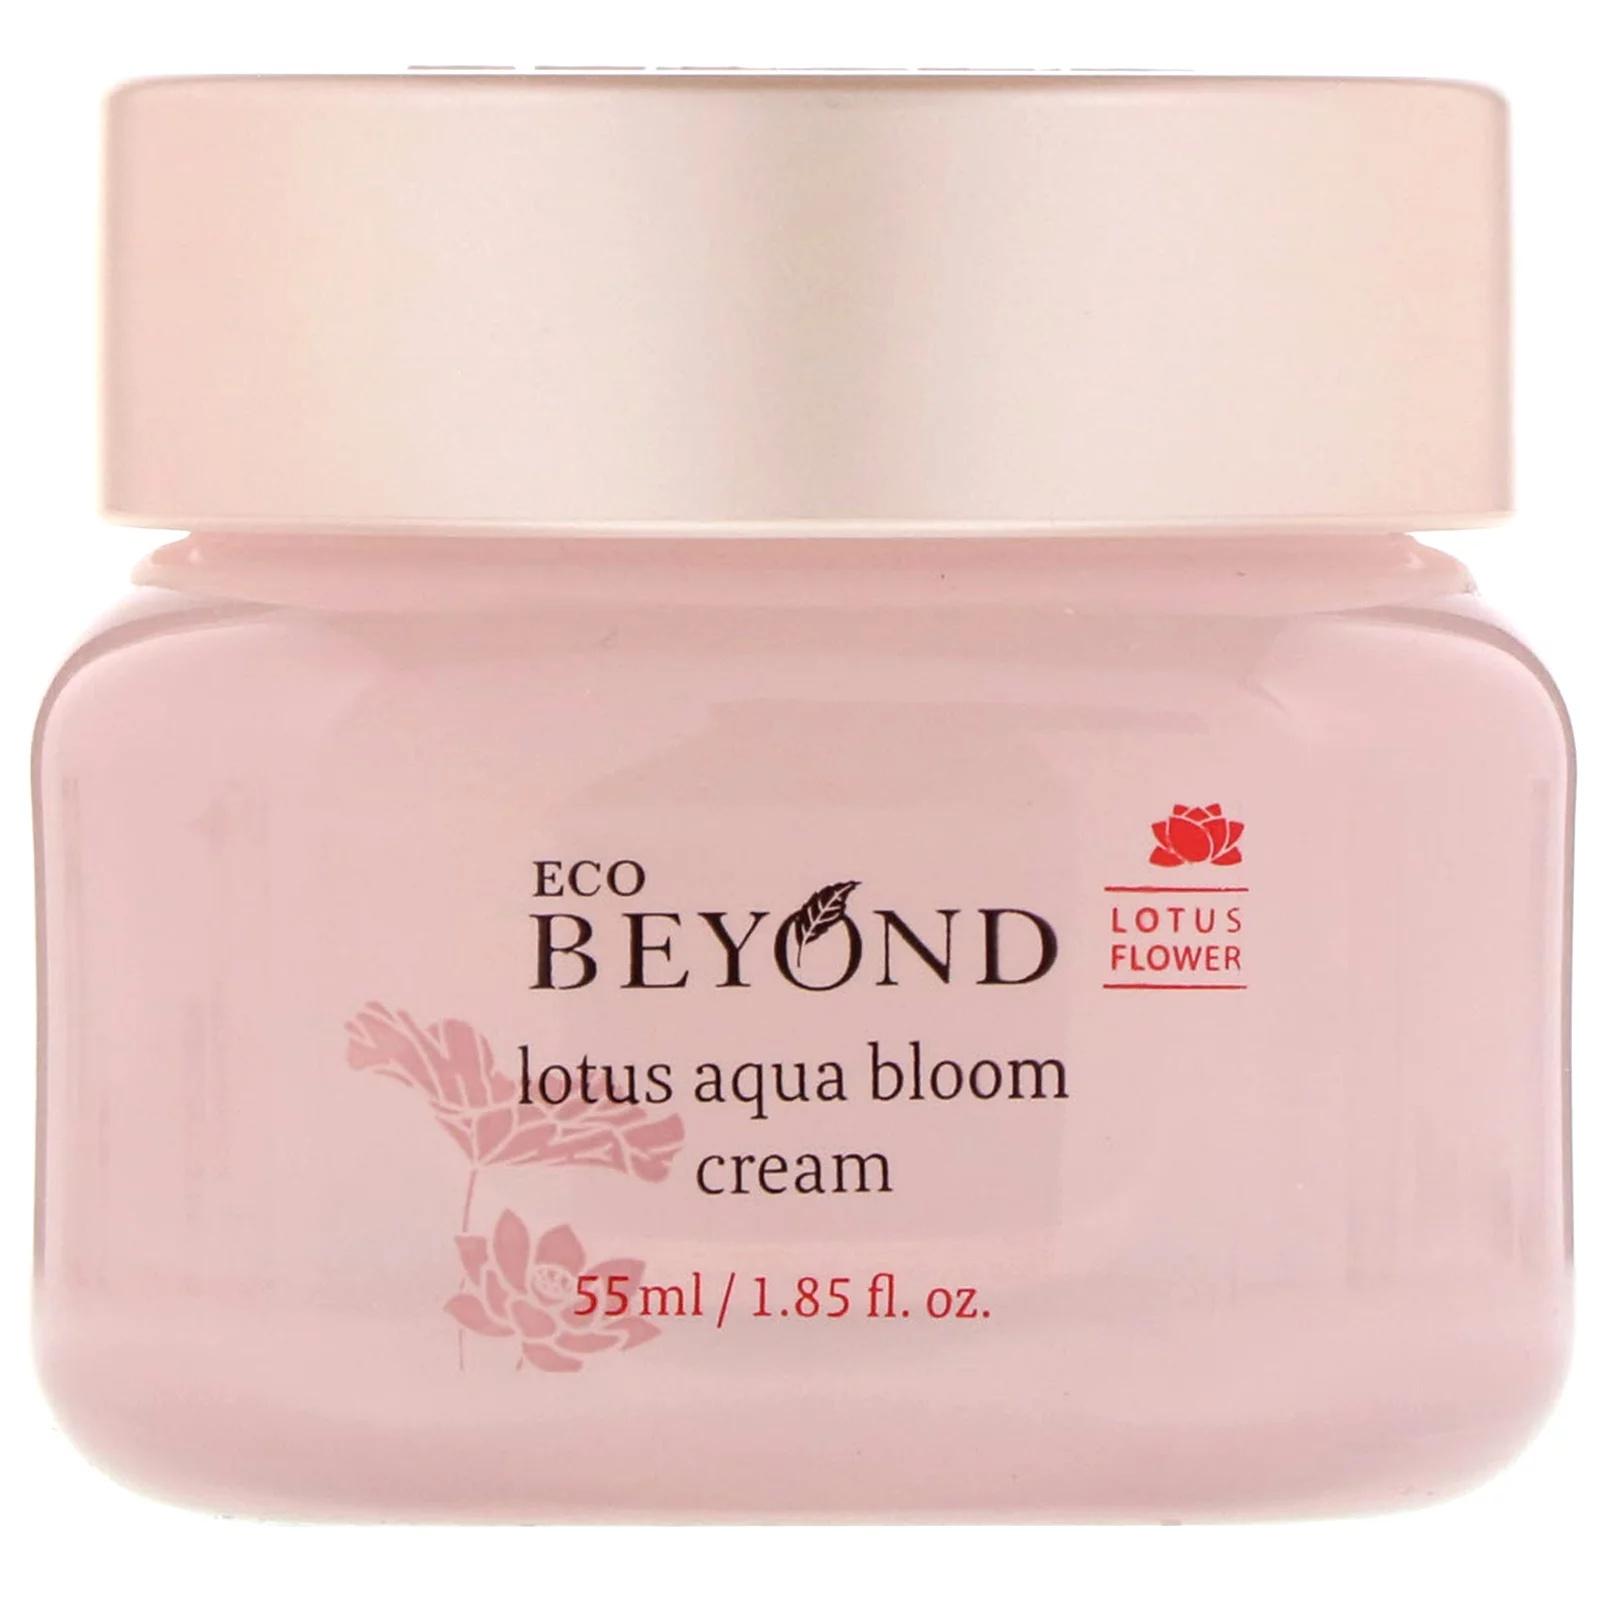 BEYOND Lotus Aqua Bloom Cream